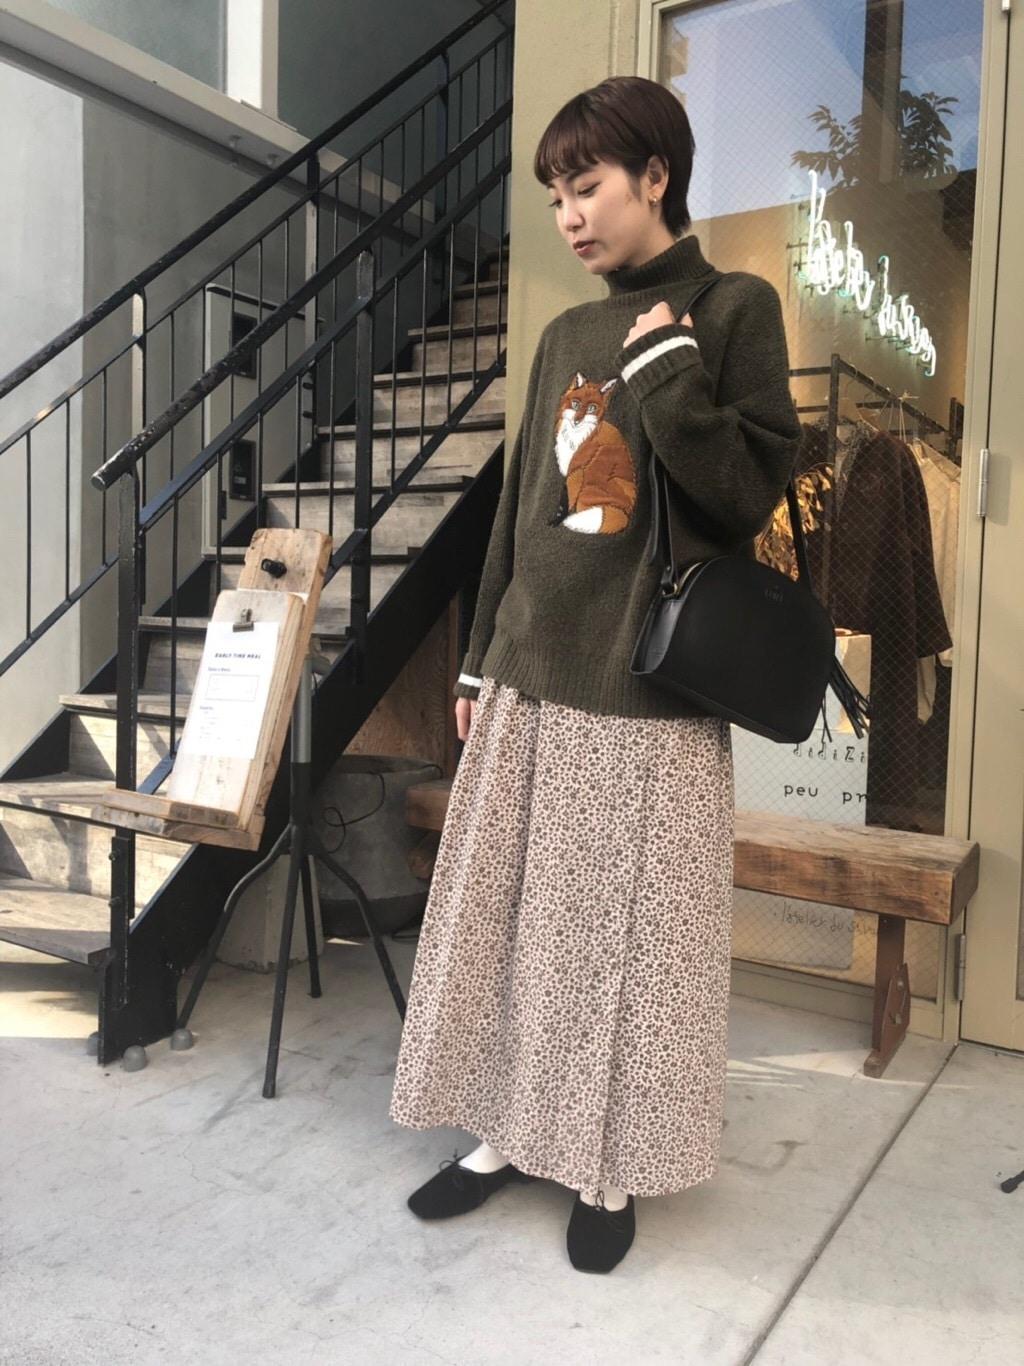 l'atelier du savon 名古屋栄路面 身長:161cm 2019.12.04